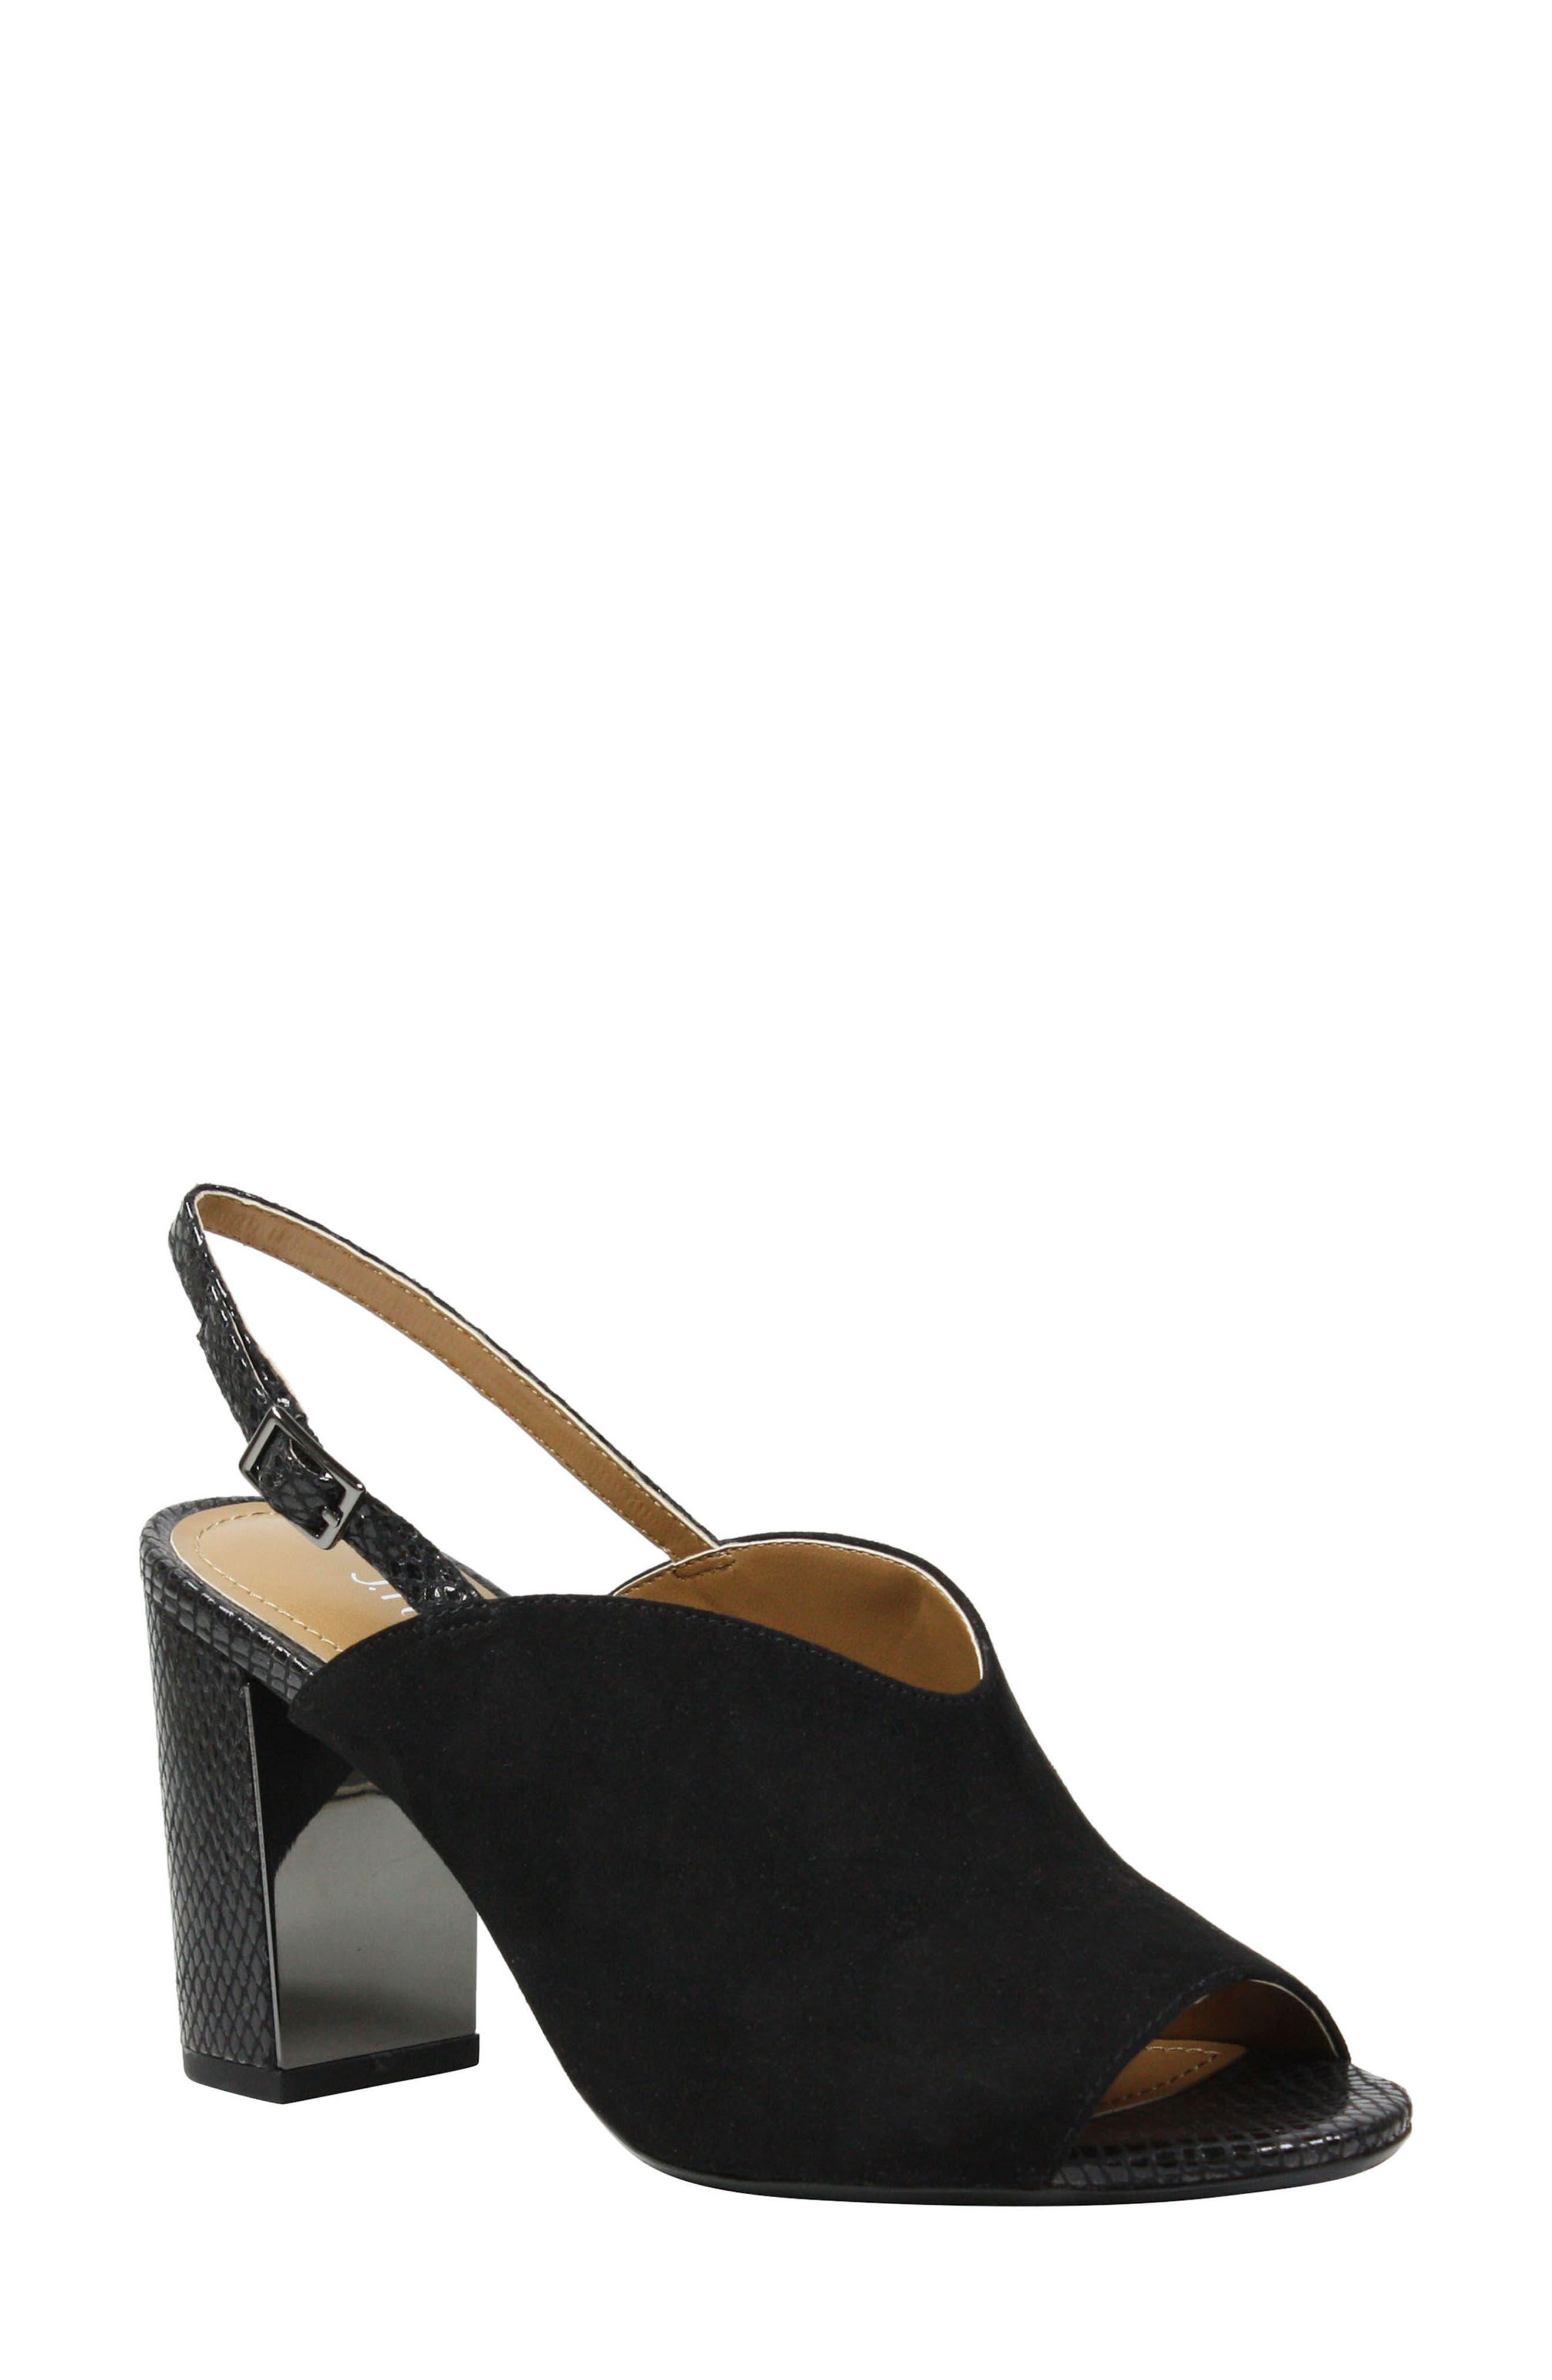 Maarya Block Heel Sandal,                             Main thumbnail 1, color,                             001